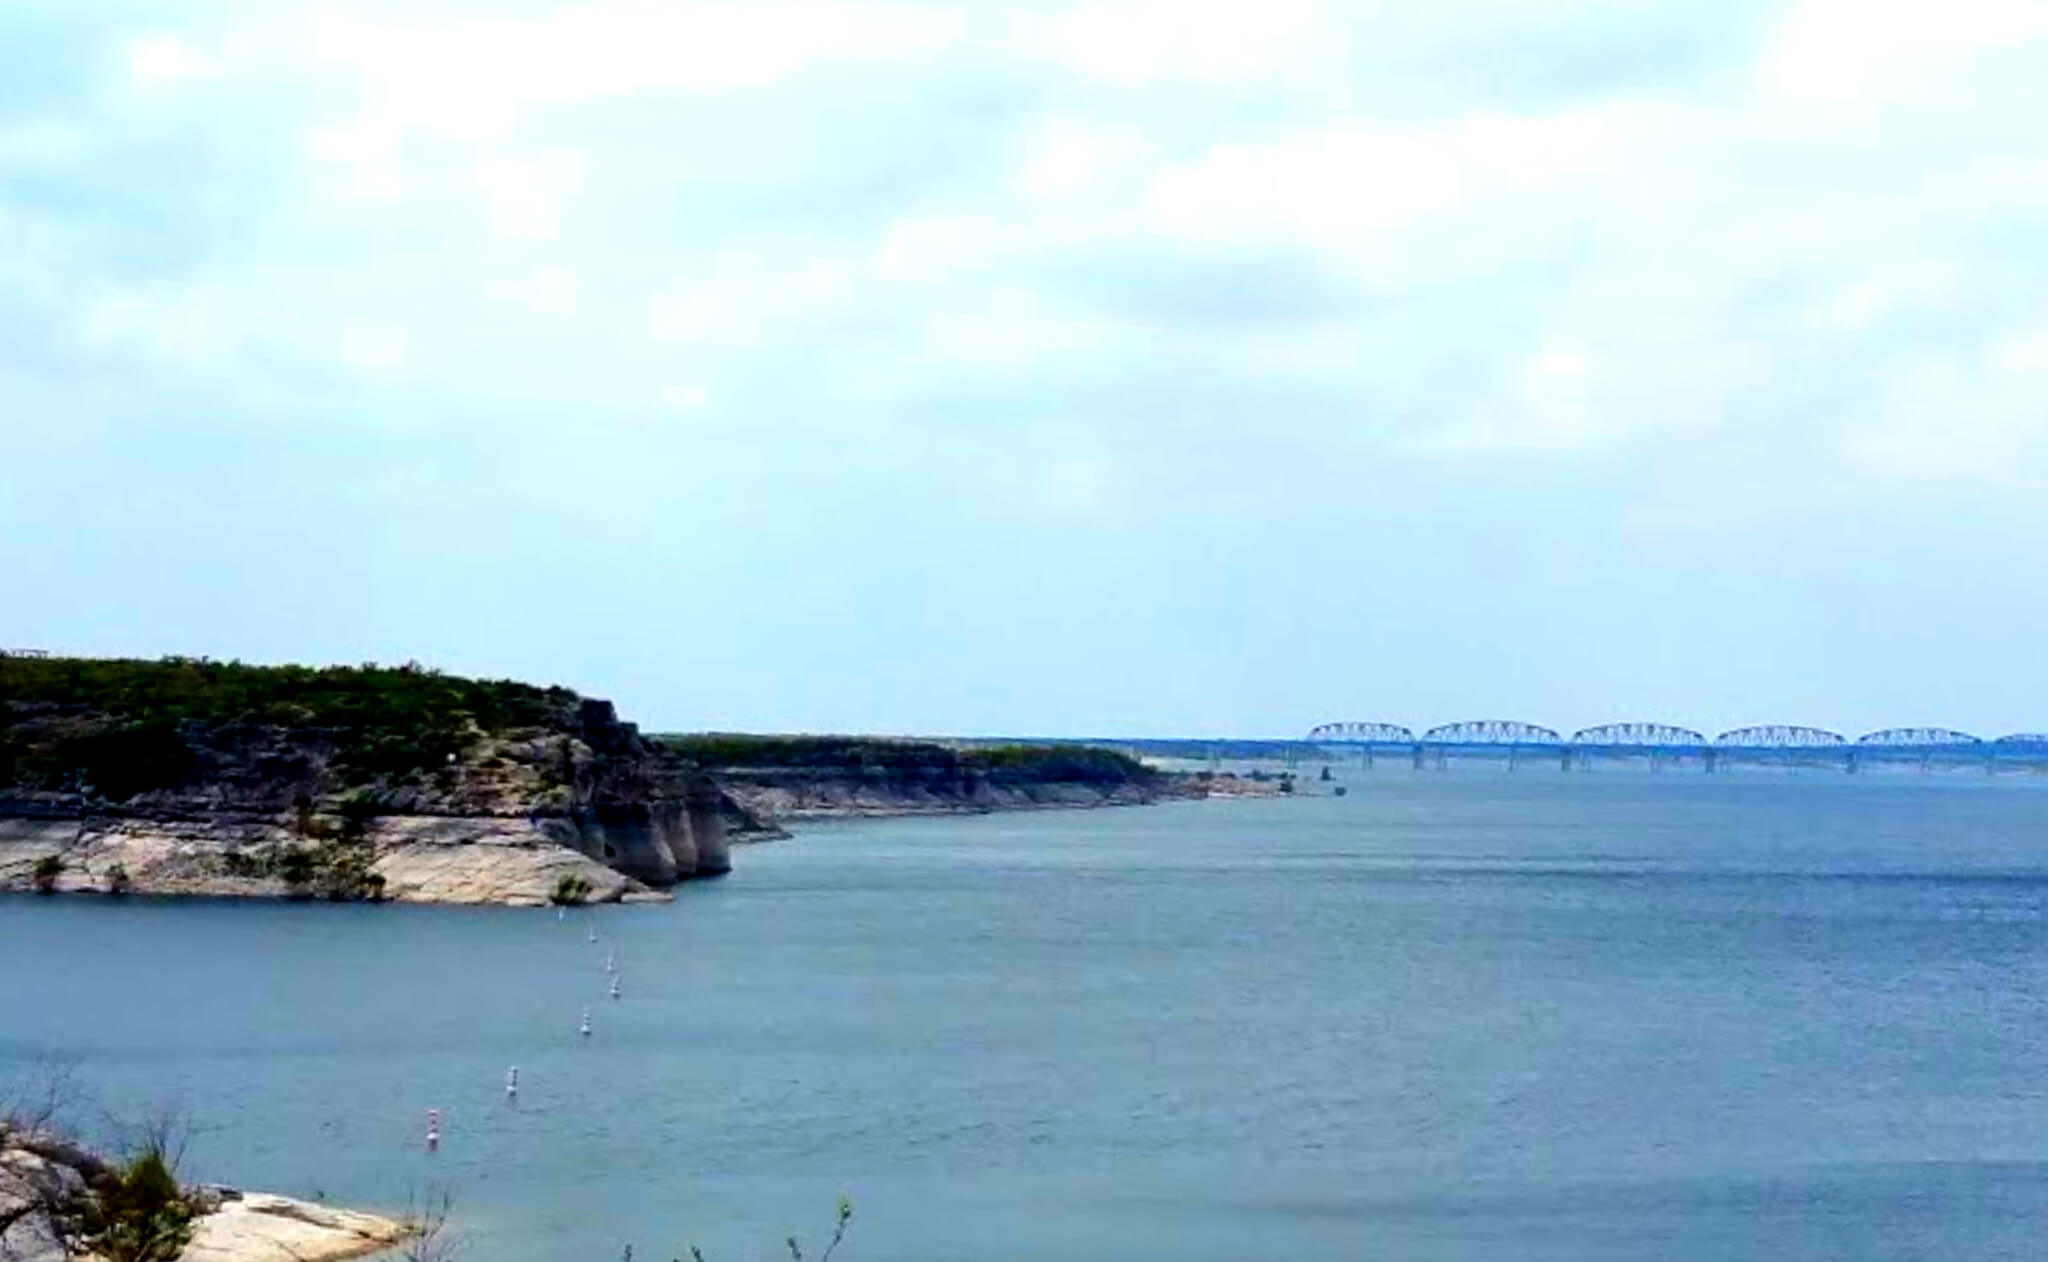 Amistad-Lake-Fishing-Report-Guide-Texas-TX-05